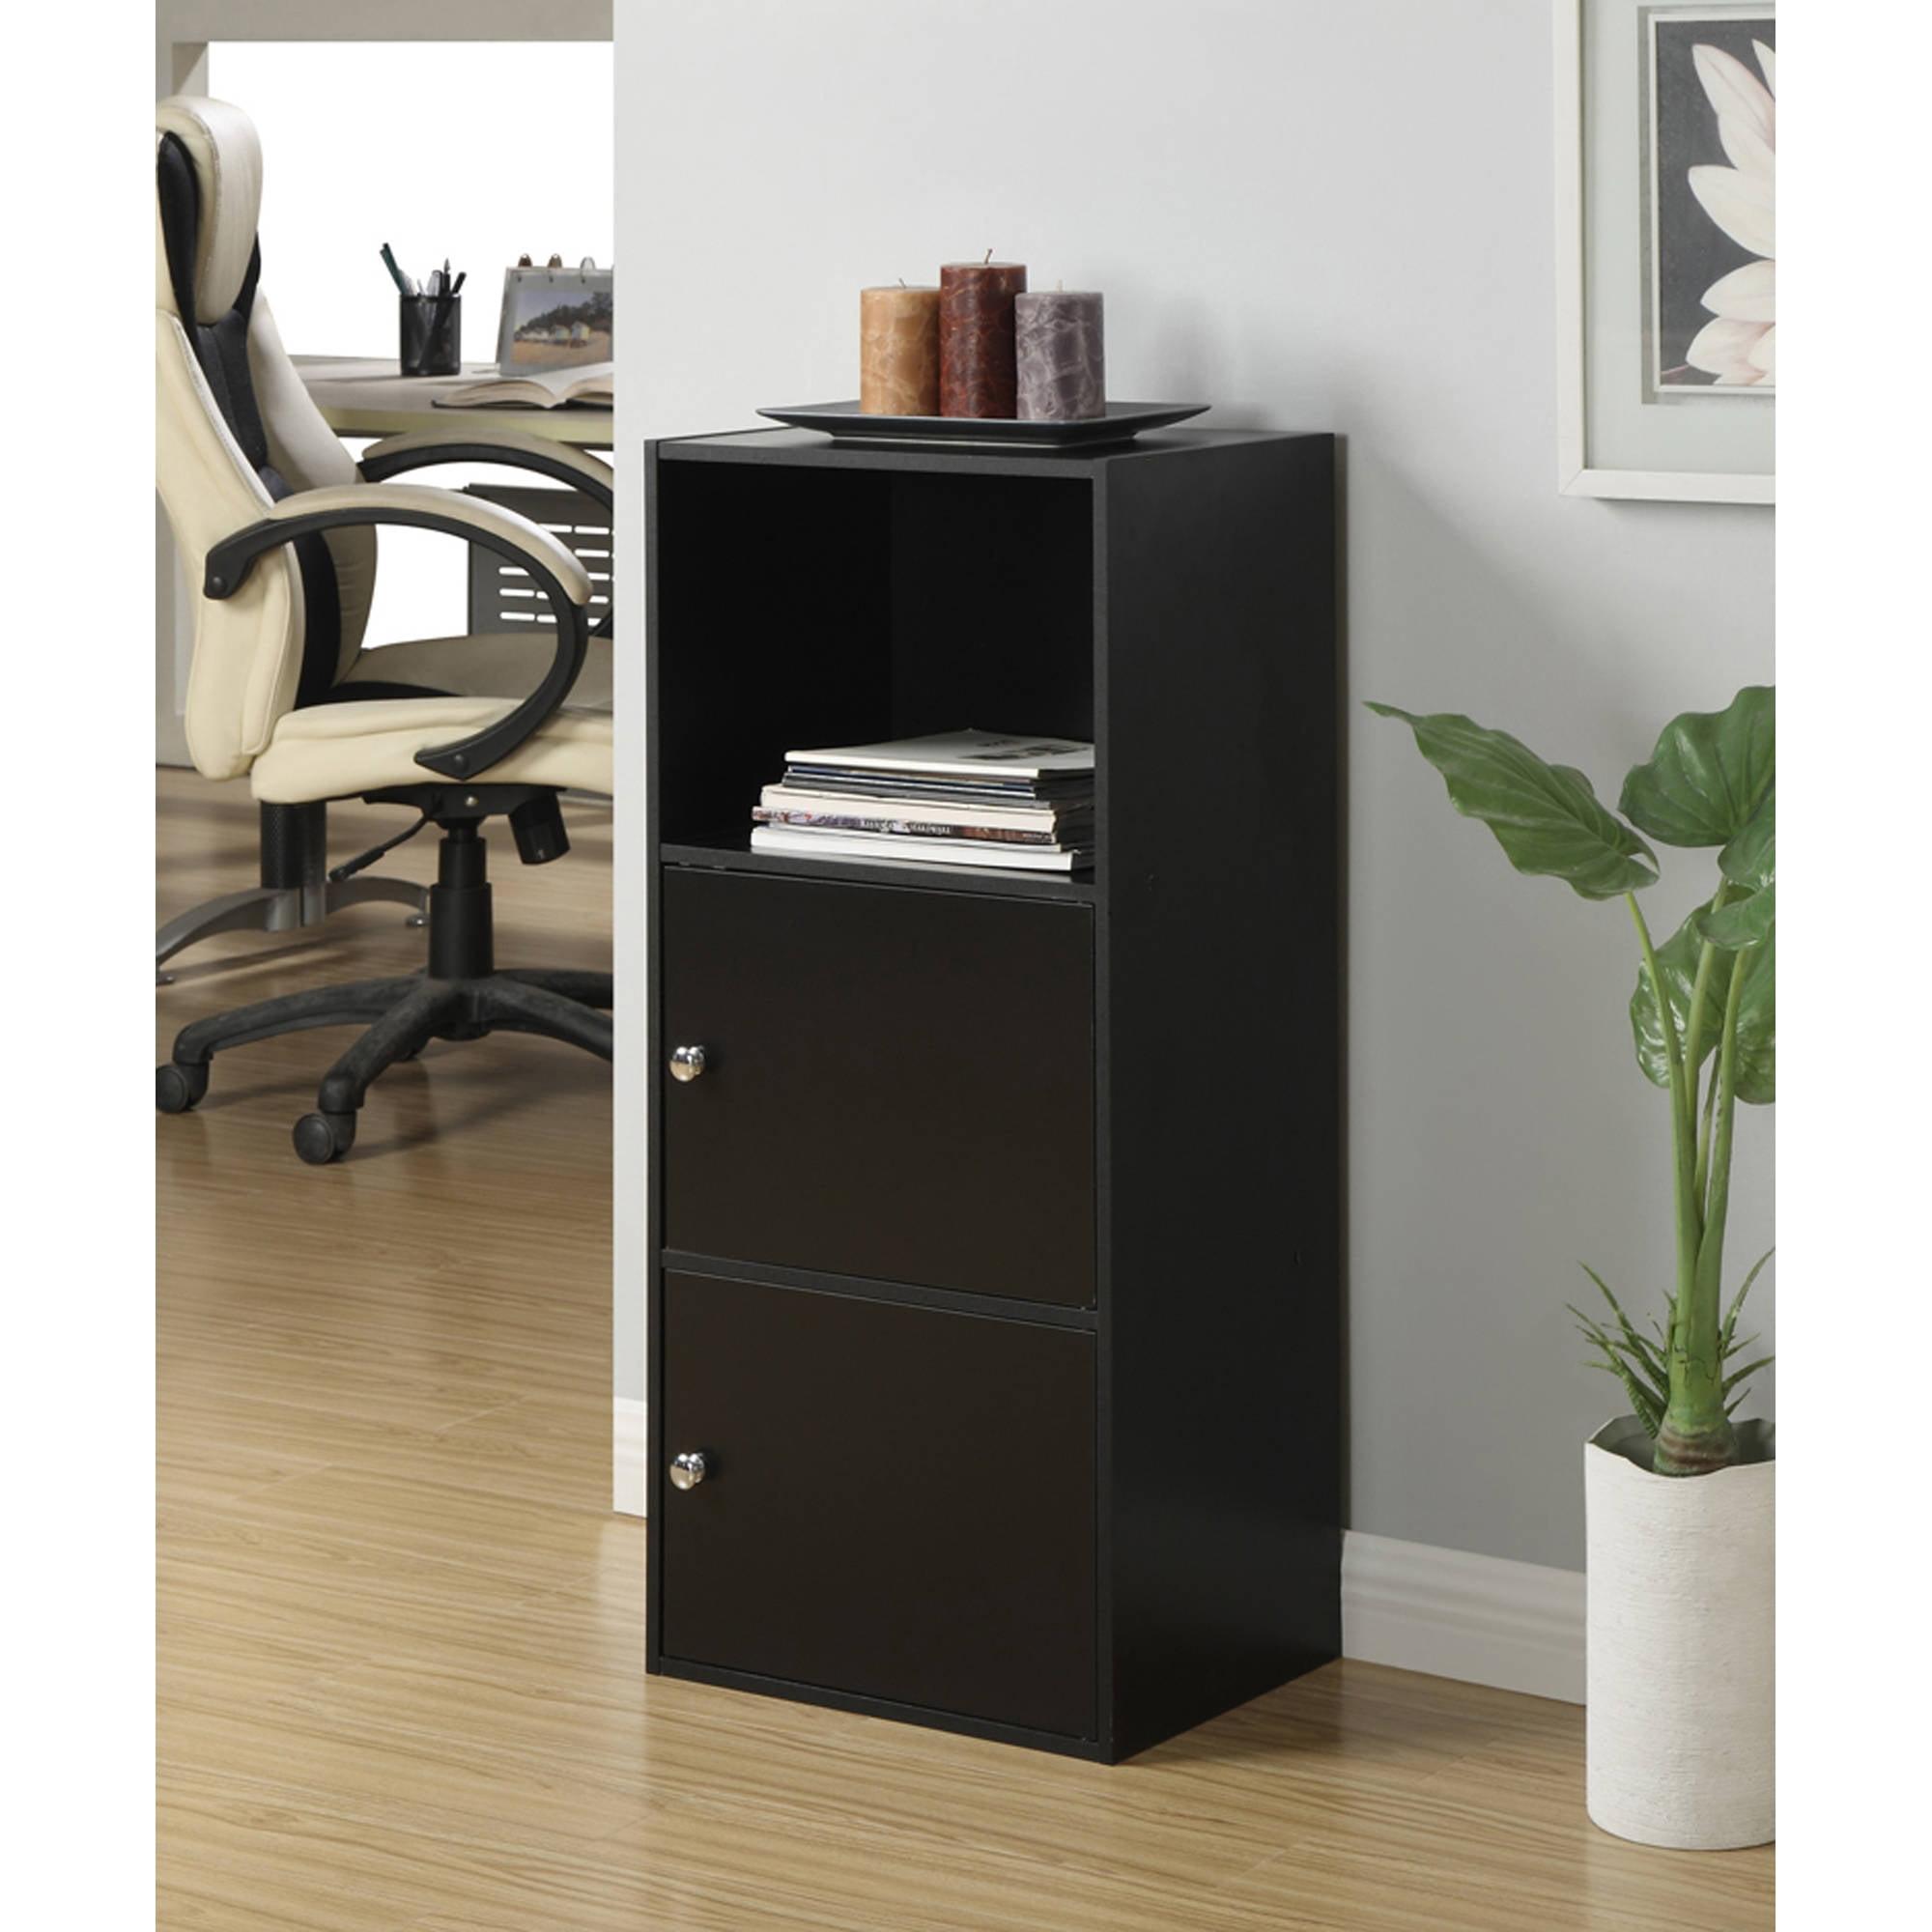 Convenience Concepts X-Tra Storage 2-Door Modular Cabinet, Black